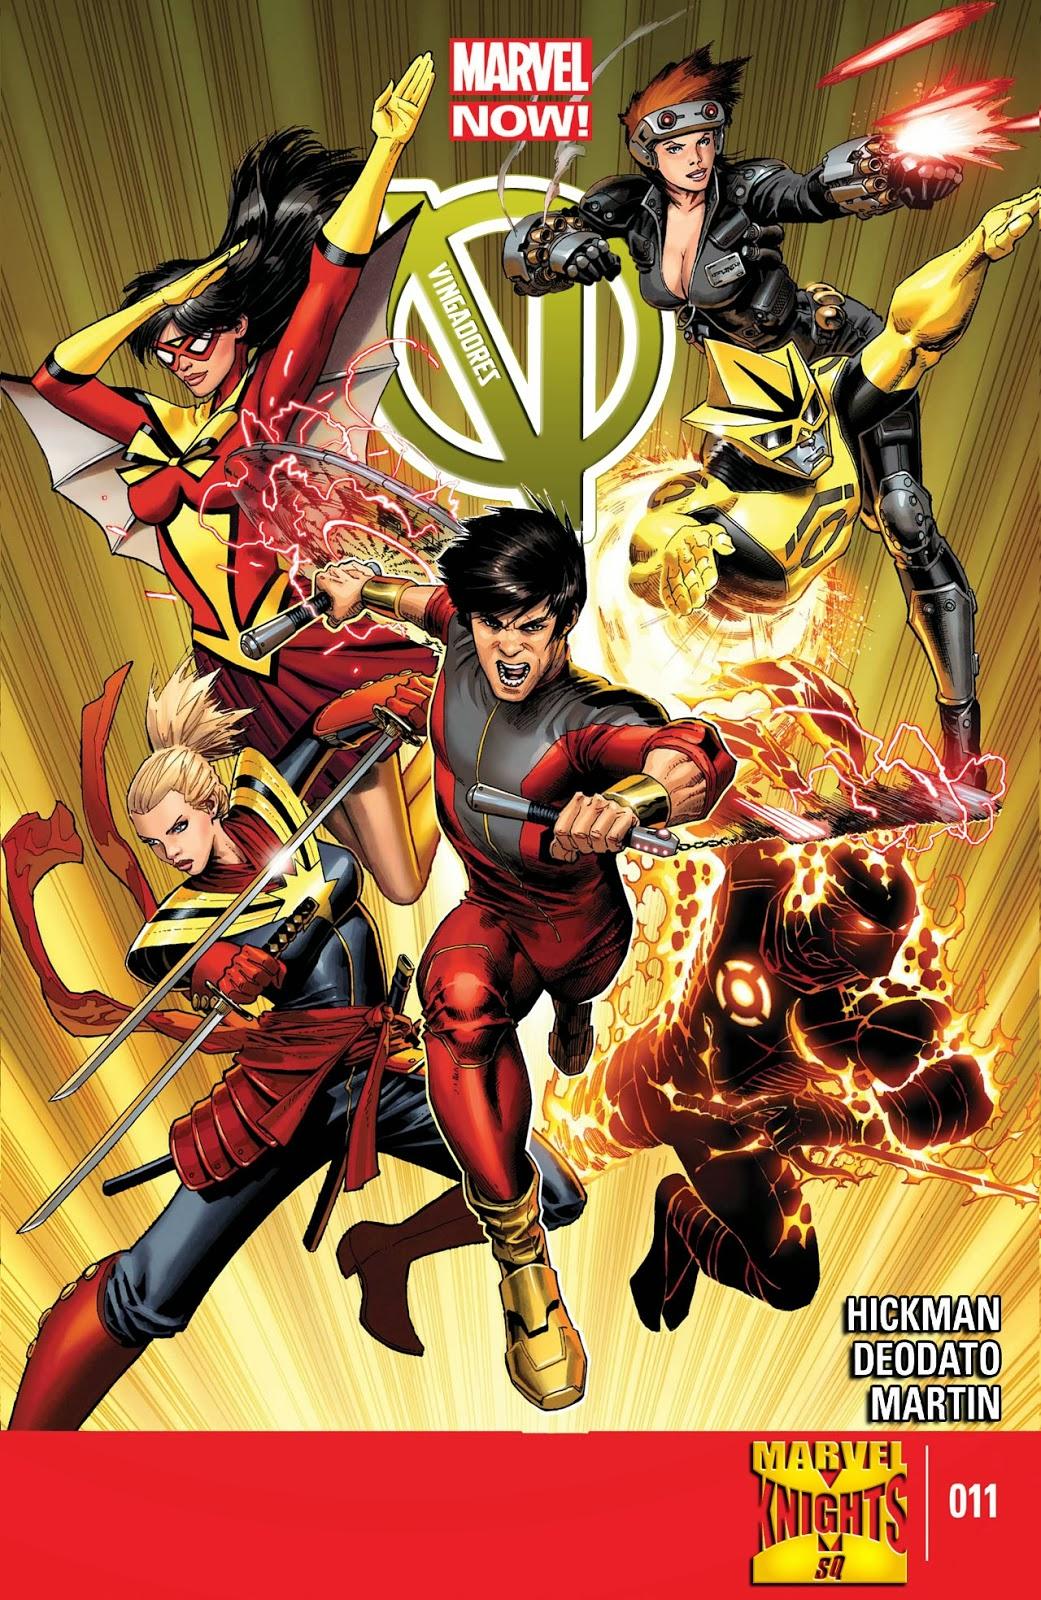 Nova Marvel! Vingadores #11